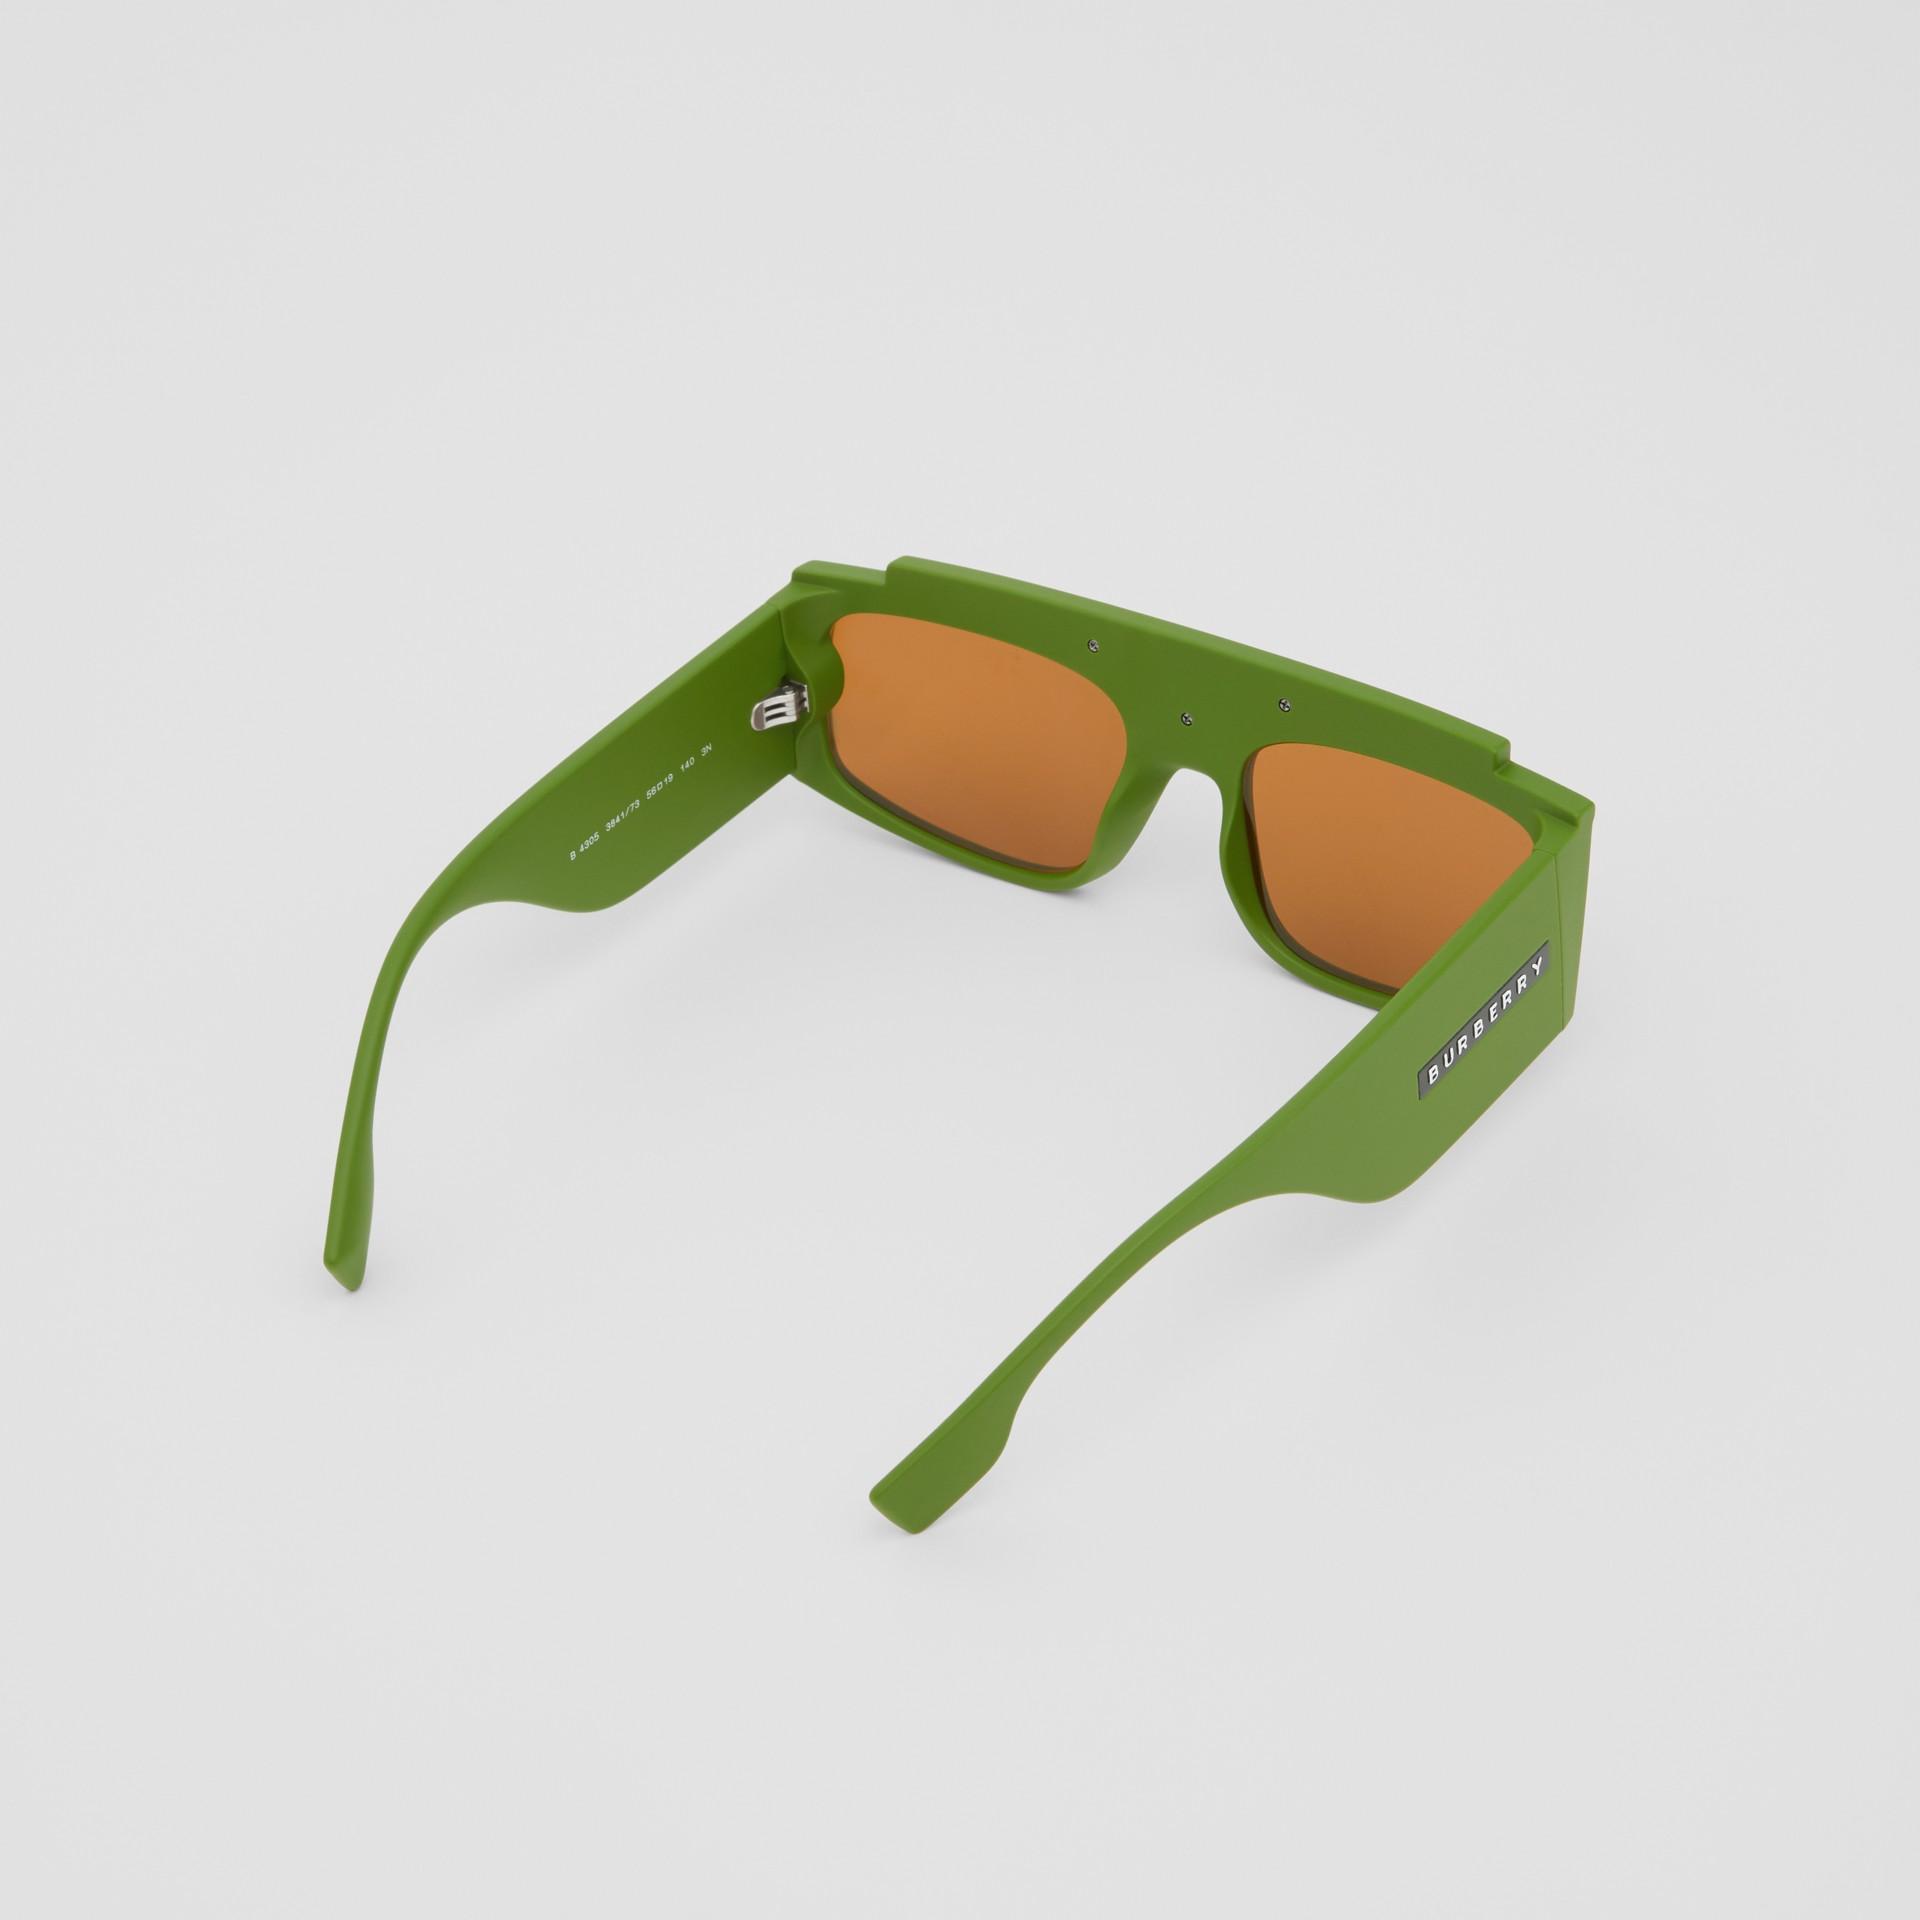 Rectangular Frame Sunglasses in Green - Women | Burberry - gallery image 4